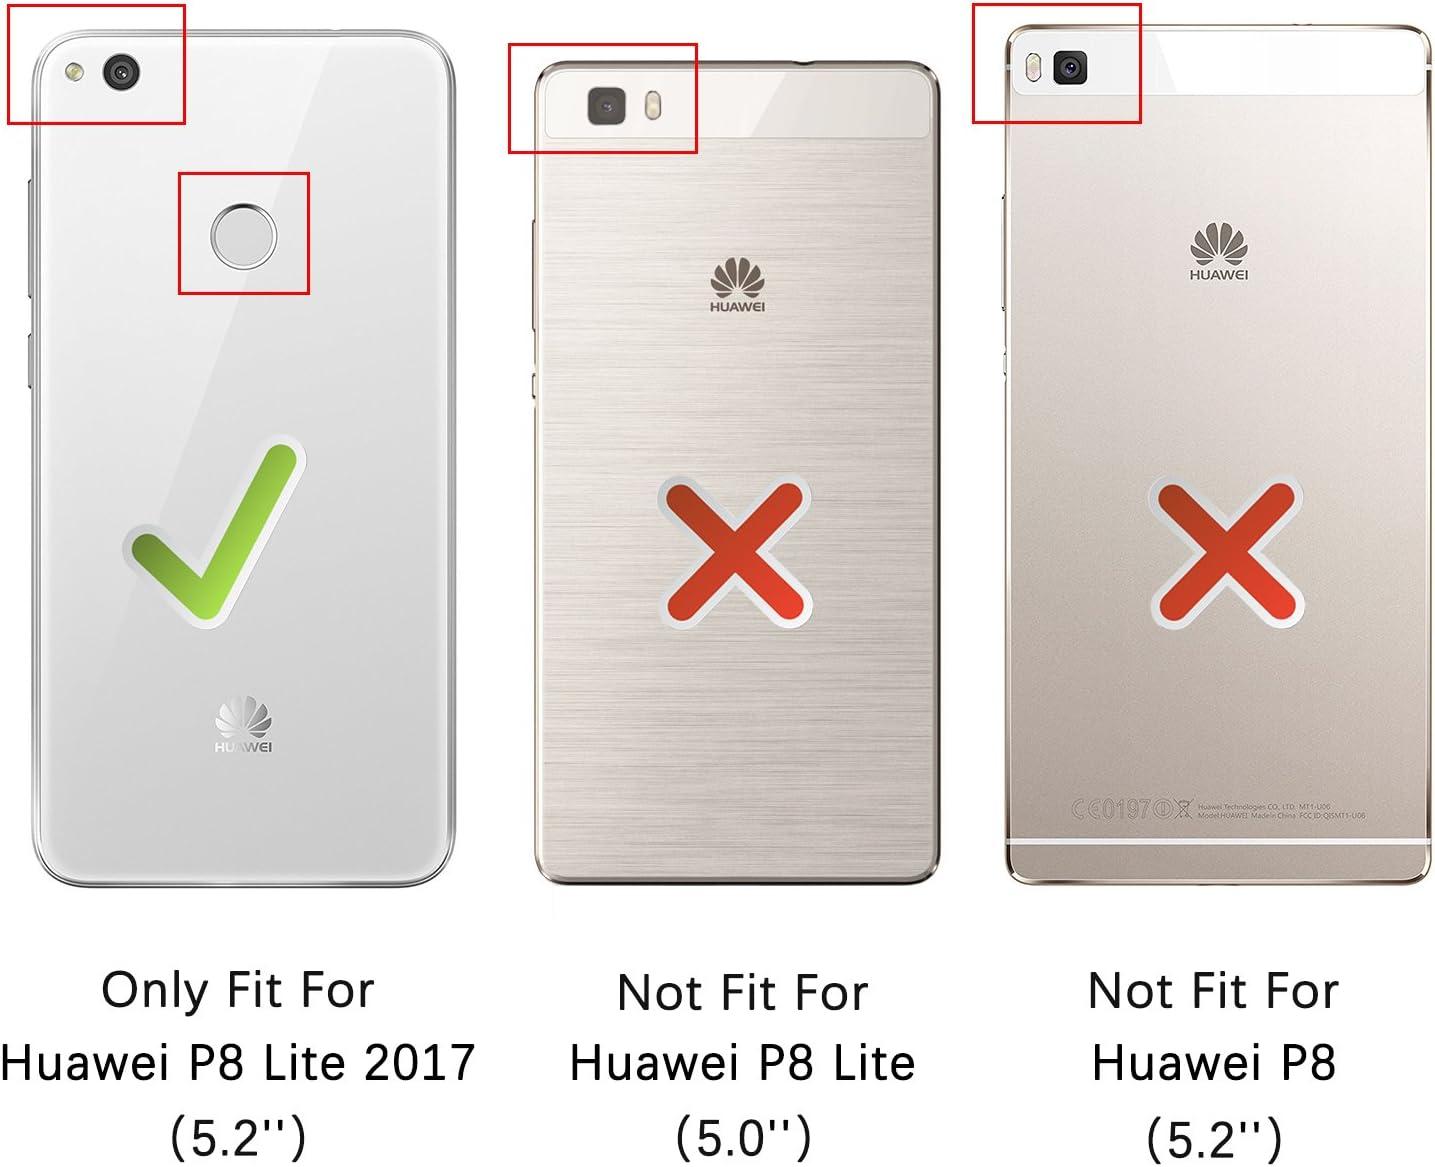 HOOMIL Funda para Huawei P8 Lite 2017, Funda de Cuero PU Premium Carcasa para Huawei P8 Lite 2017 (Negro): Amazon.es: Electrónica